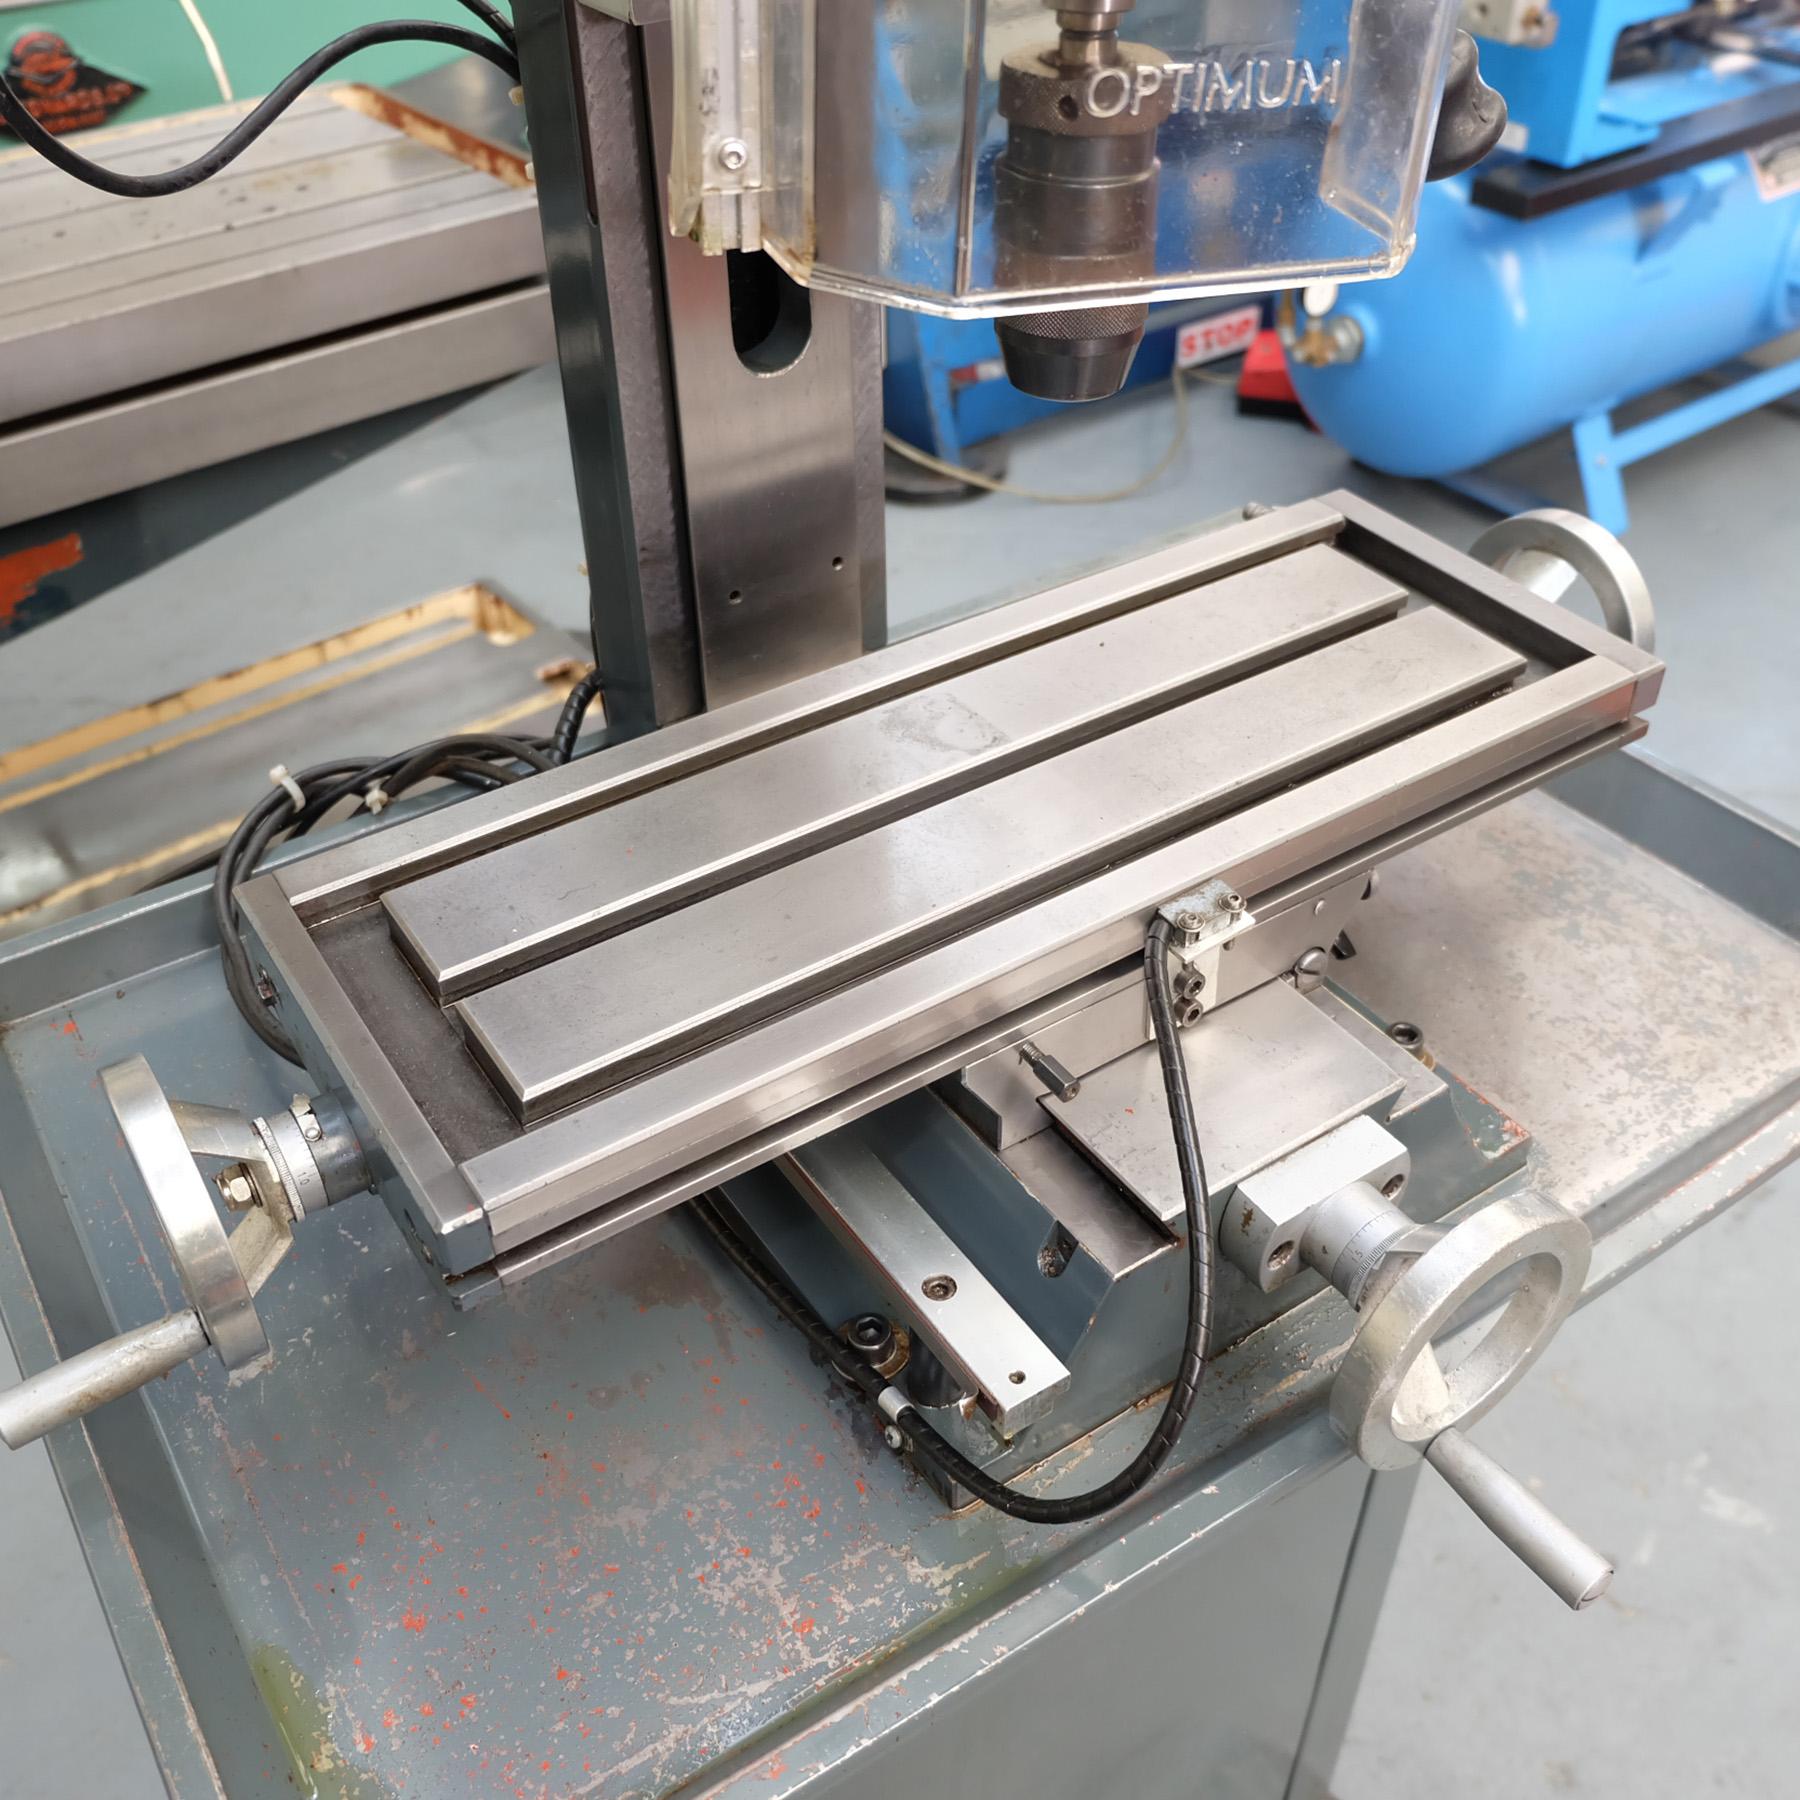 Optimum BF20 Vario Drilling/Milling Machine. - Image 8 of 11